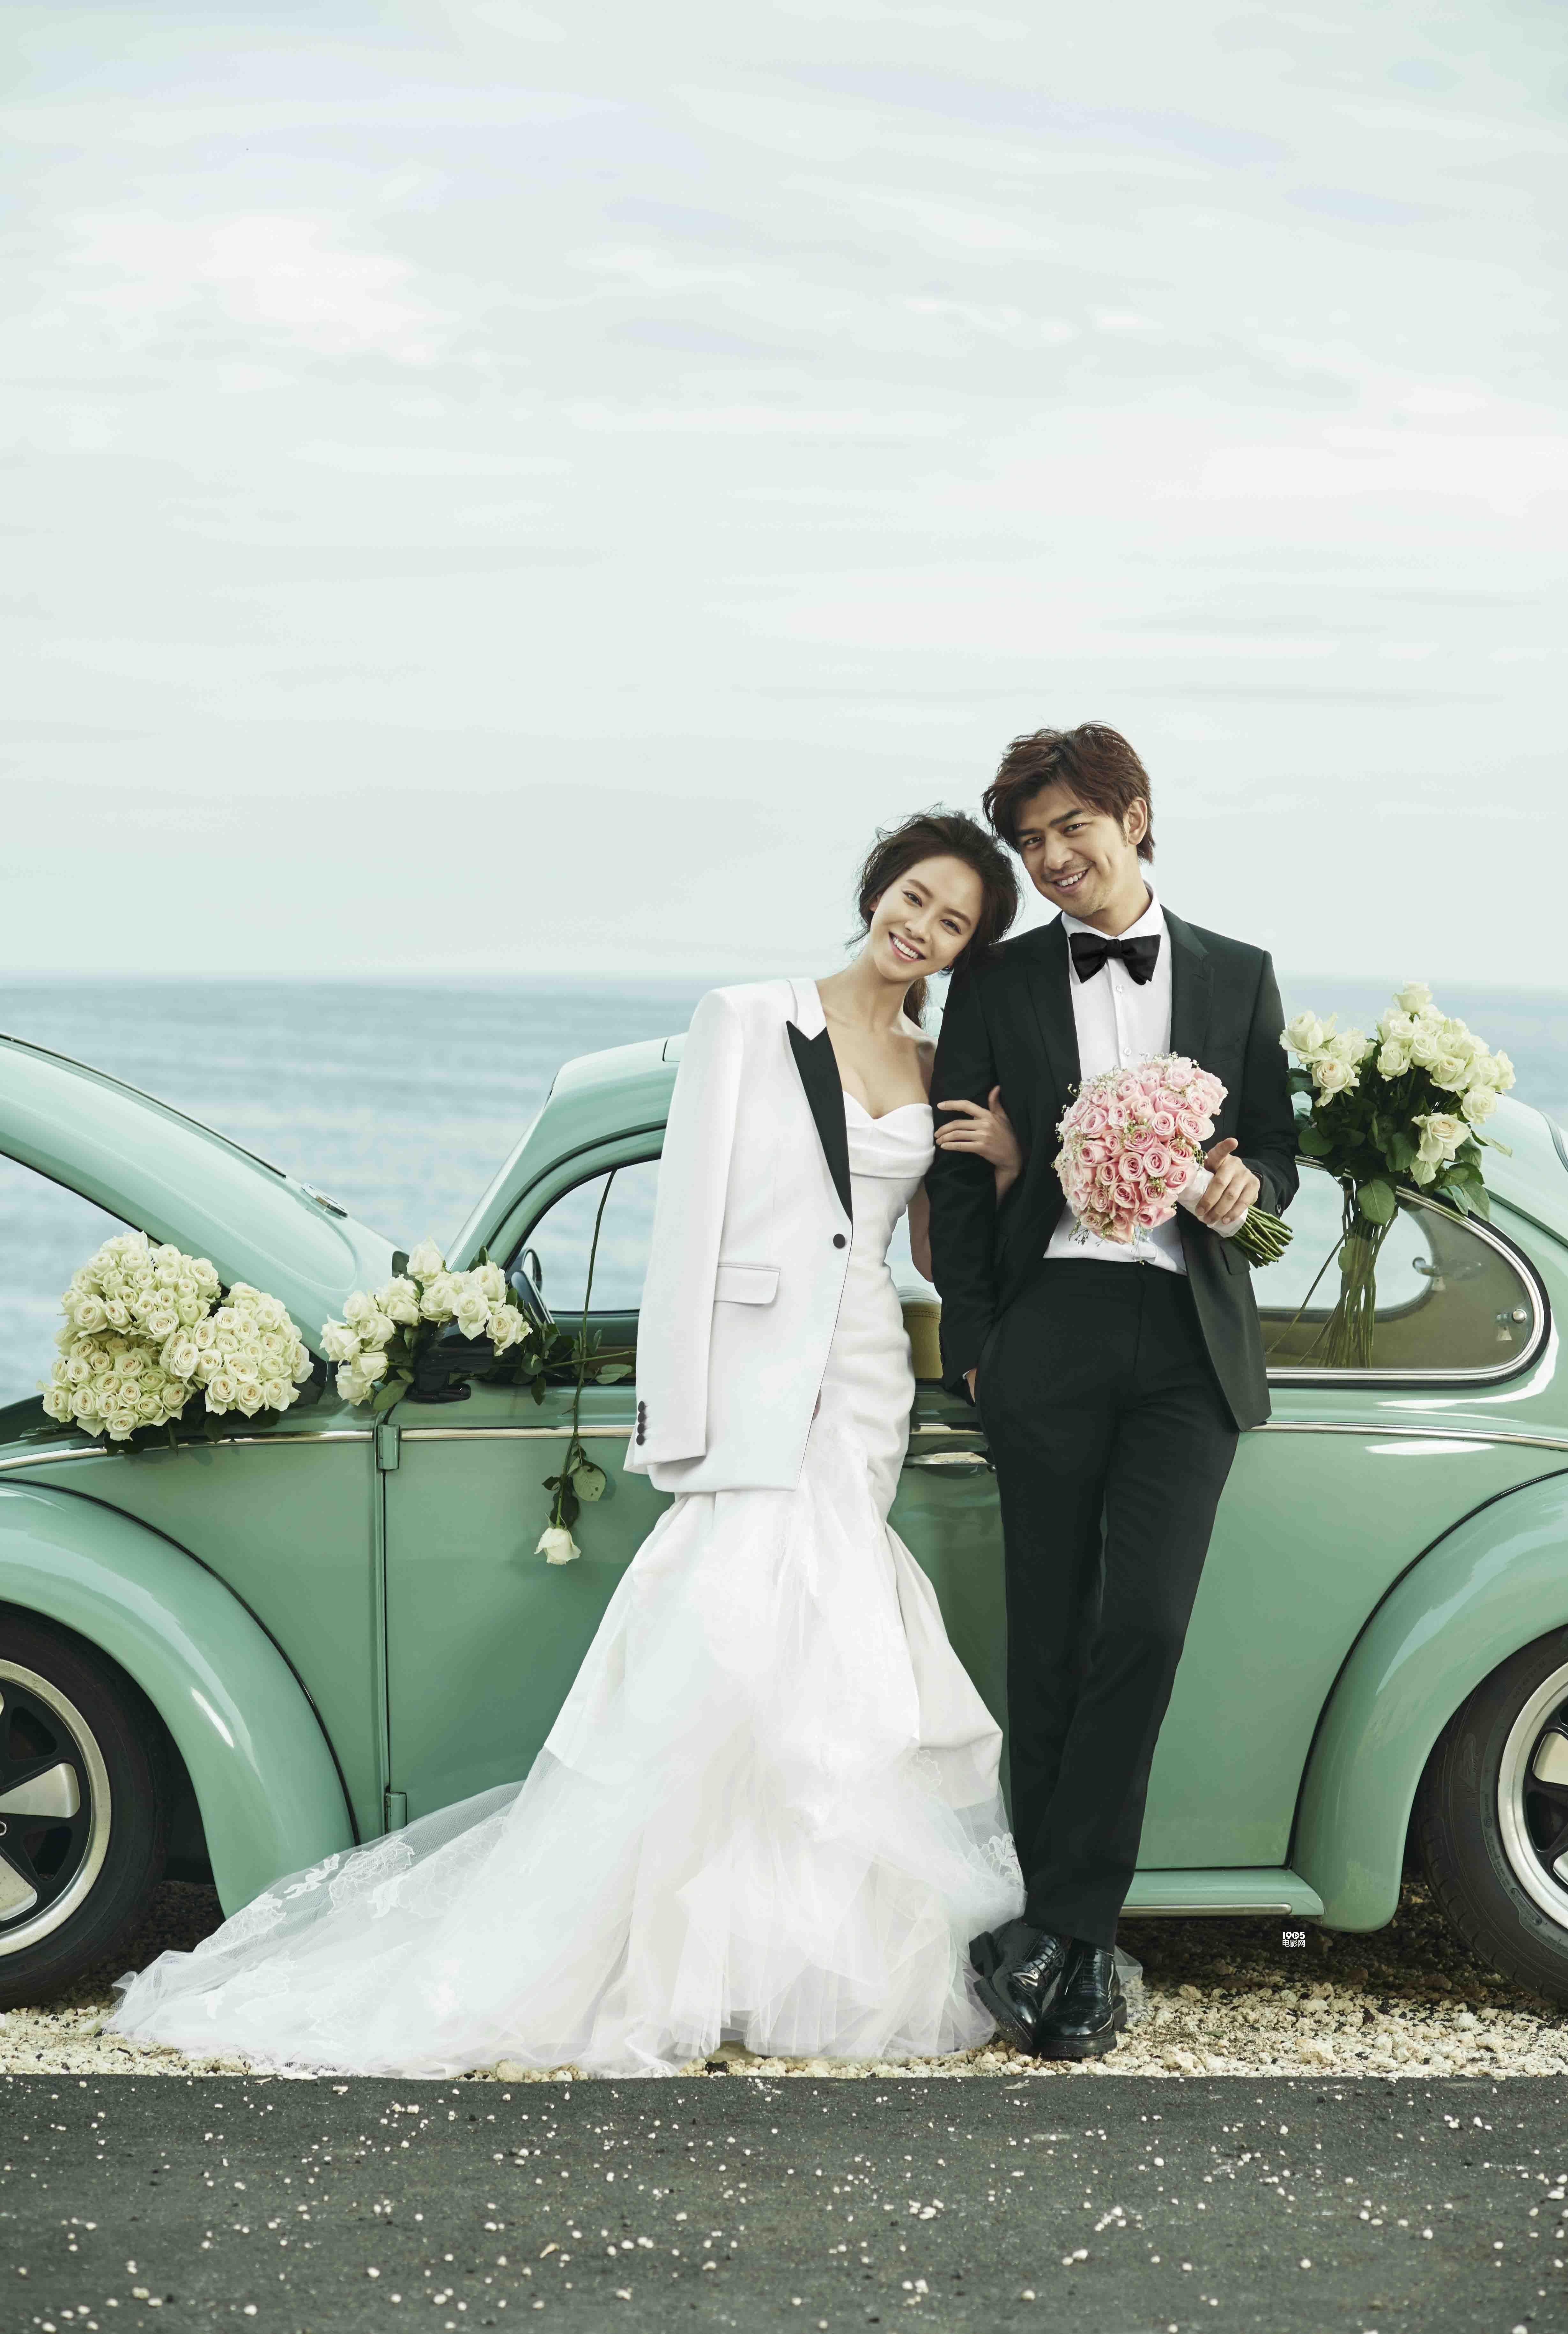 Bolin chen song ji hyo dating 6